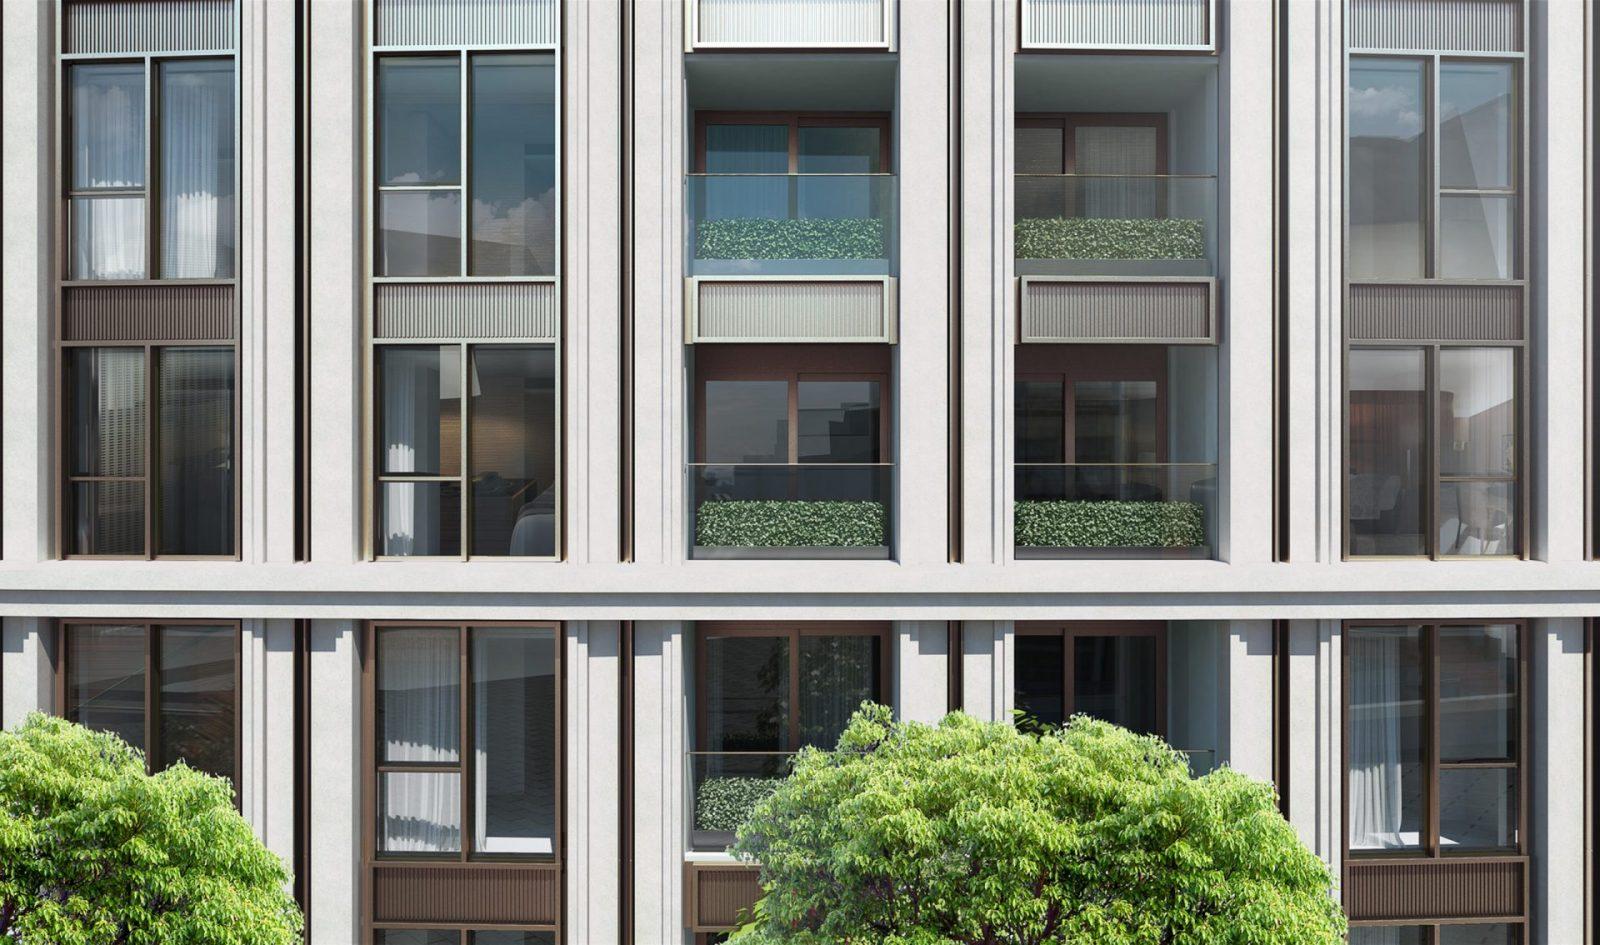 westmark tower london modern georgian architecture berkeley homes architects jersey8